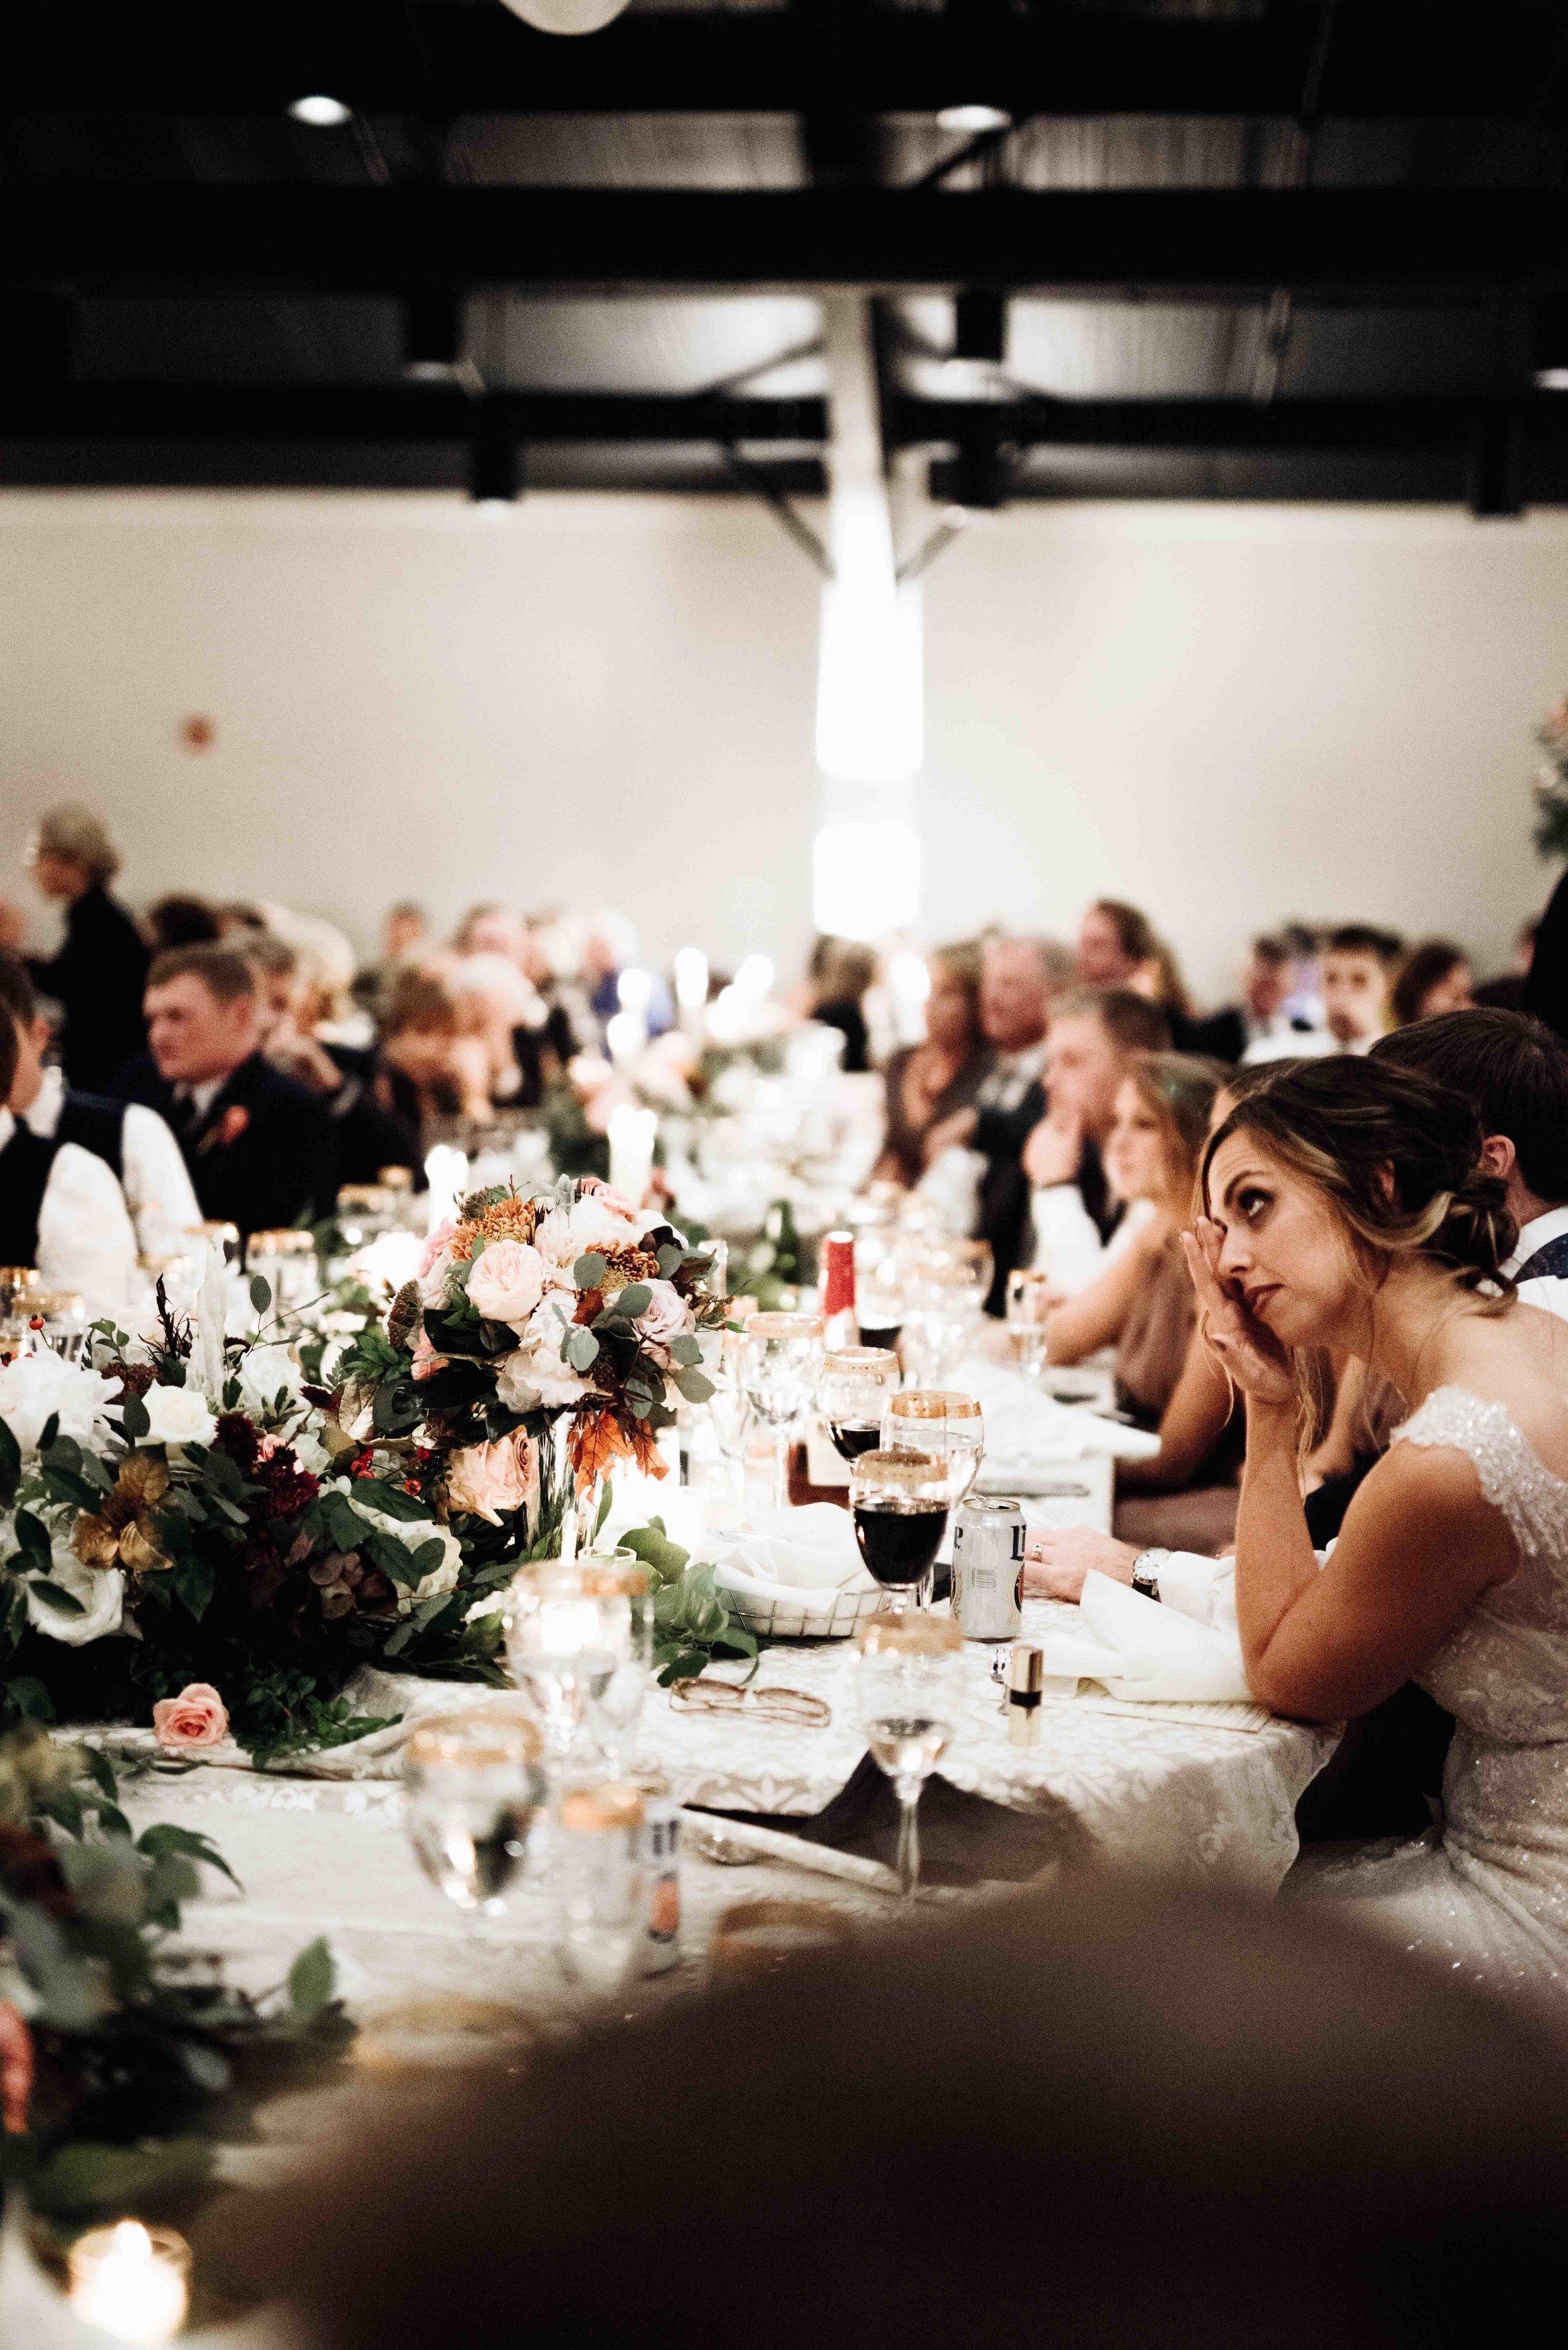 Carlee-Bob-Indianapolis-Wedding-Blog-107.jpg